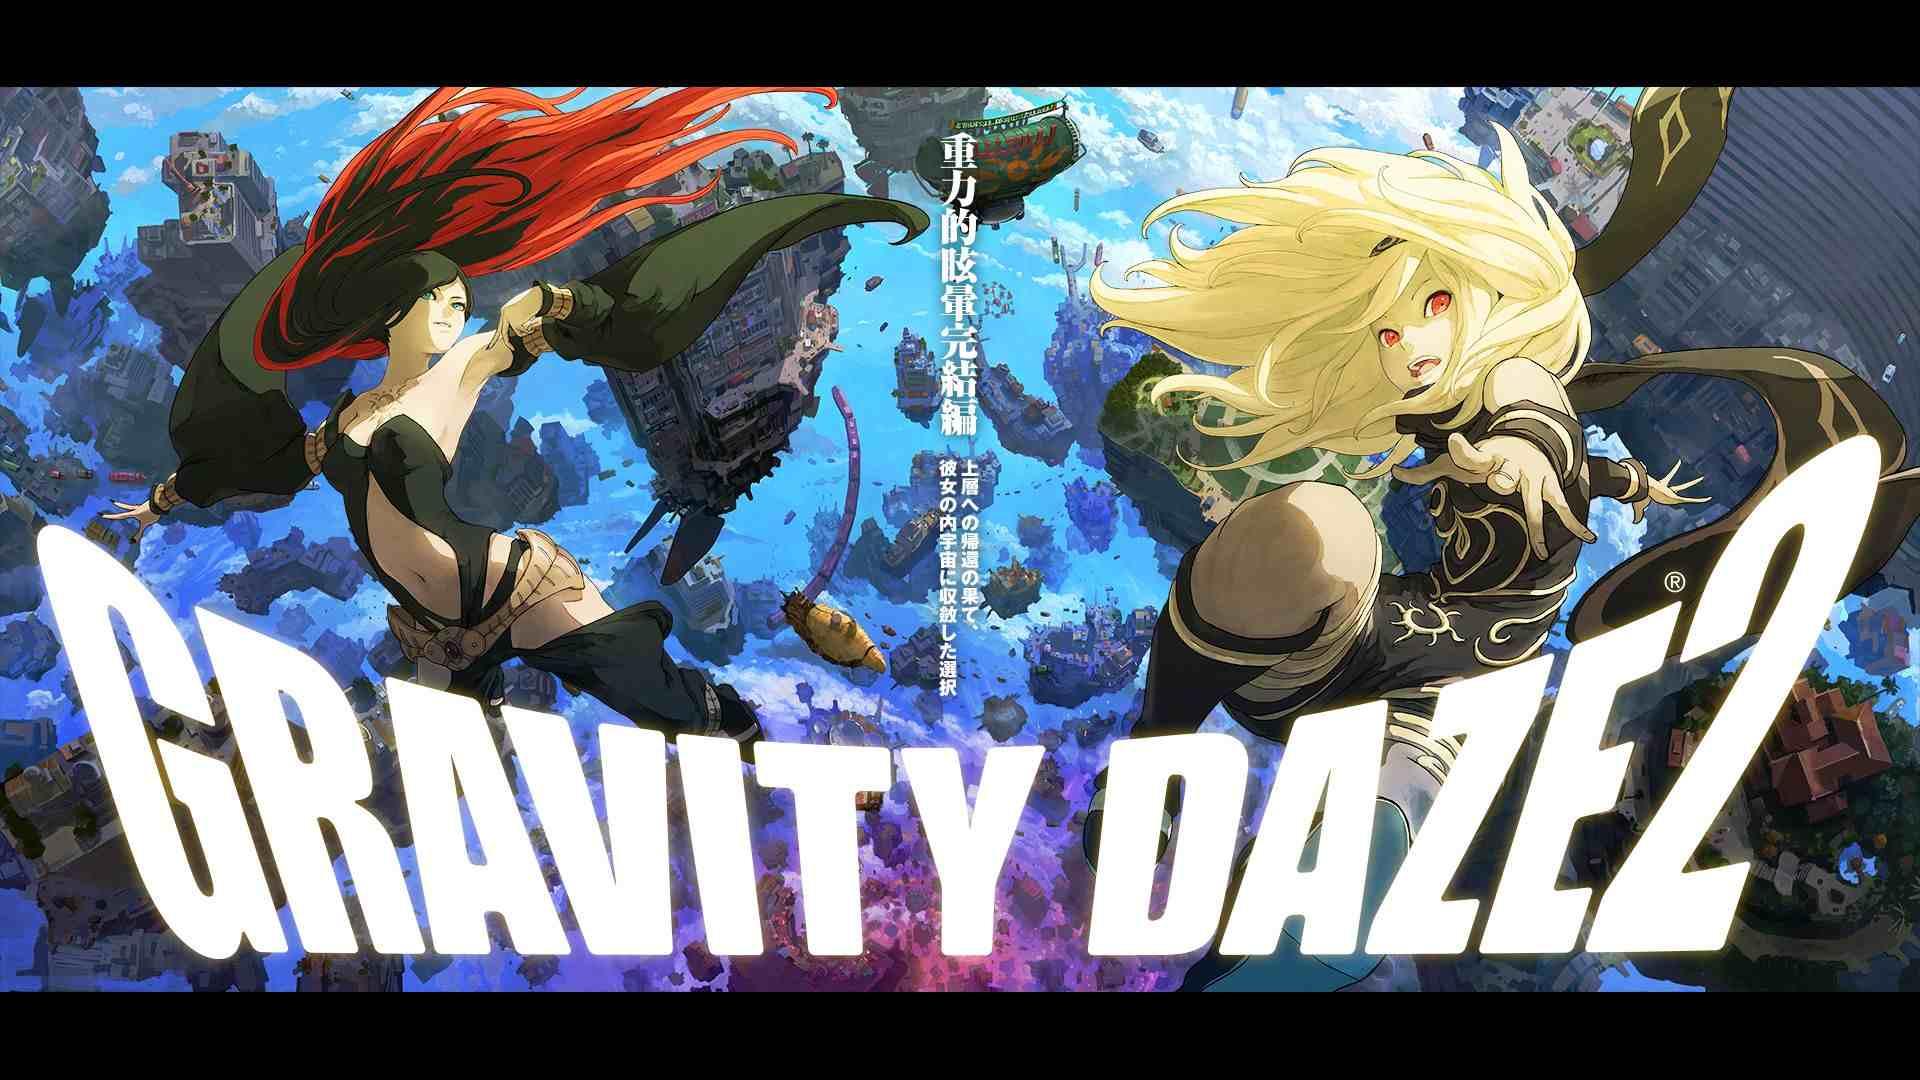 gravitydaze_remaster_150917 (3)_R